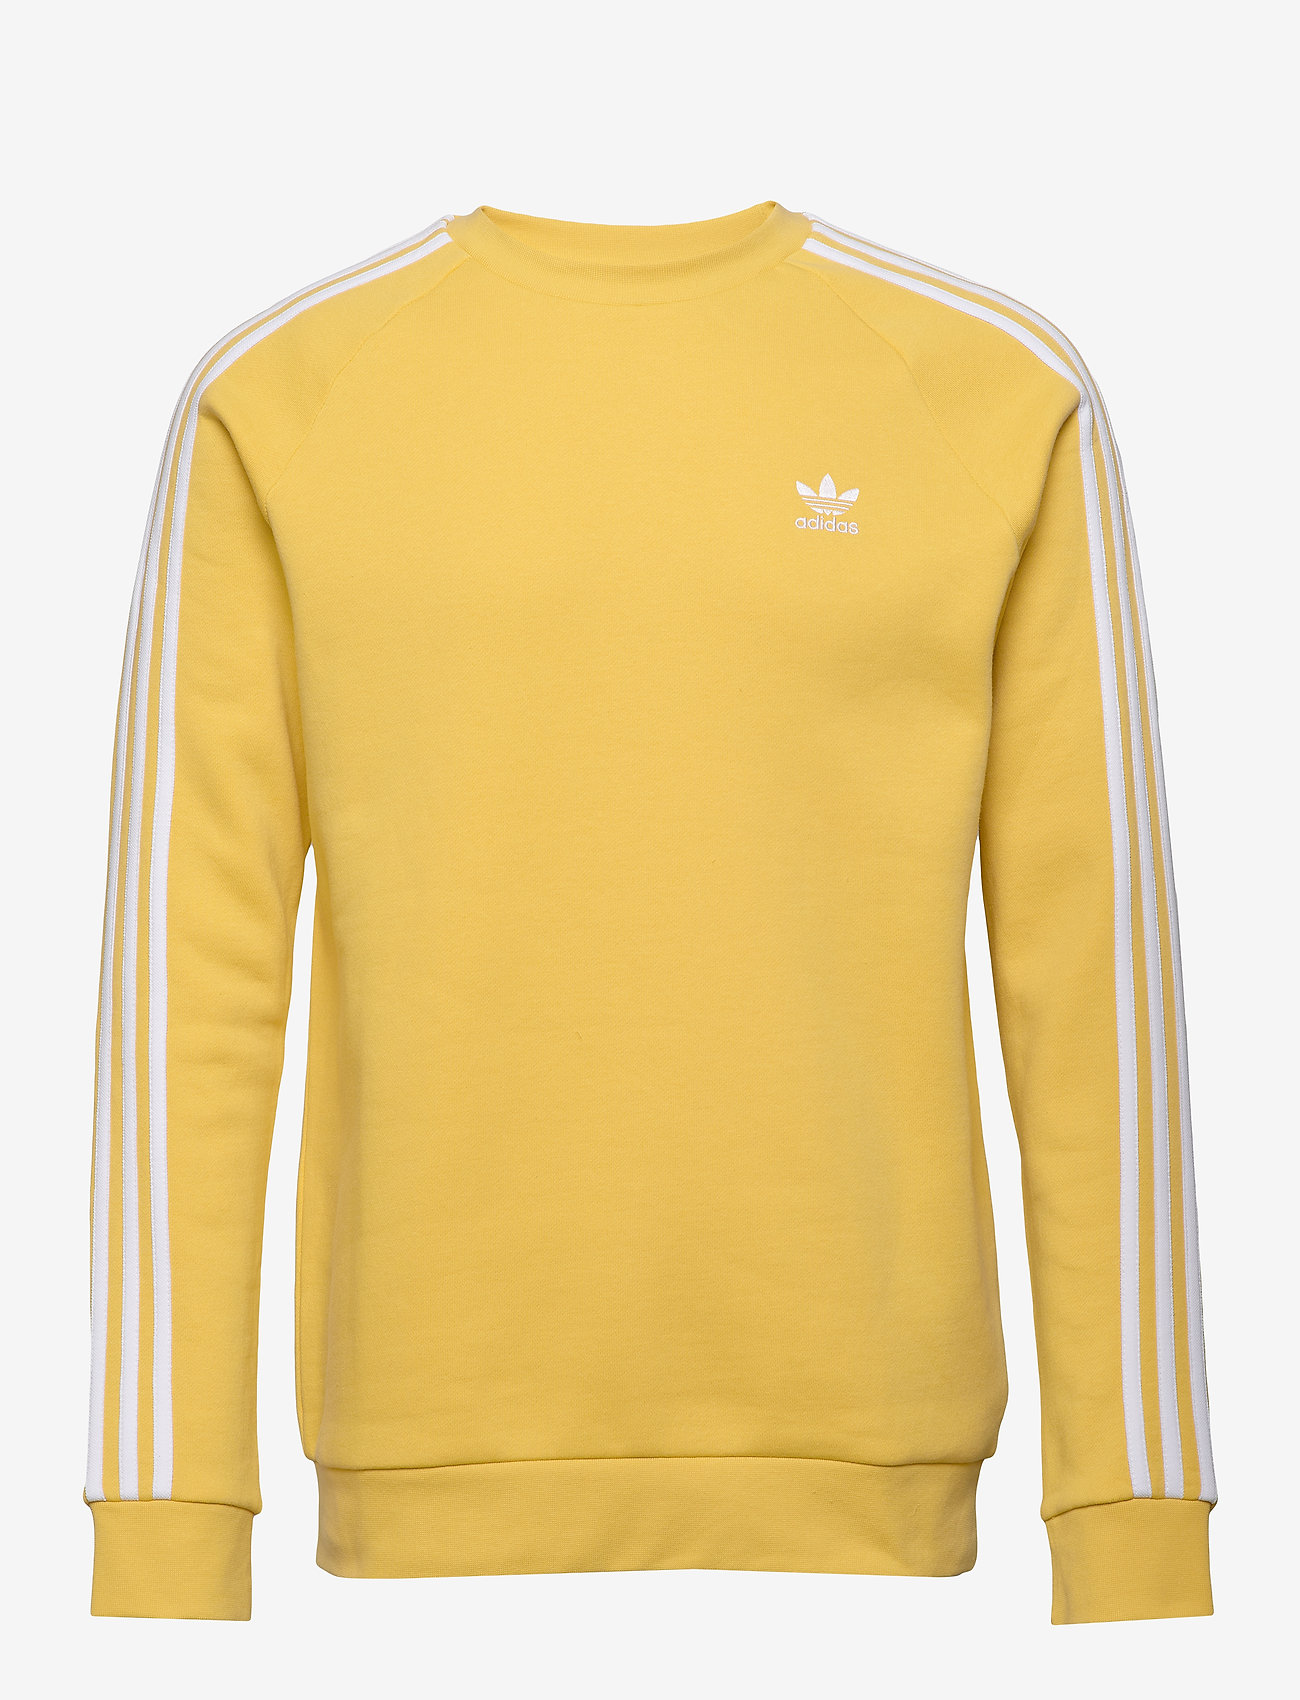 3-stripes Crew (Coryel) (54.95 €) - adidas Originals 4Wpvya4O